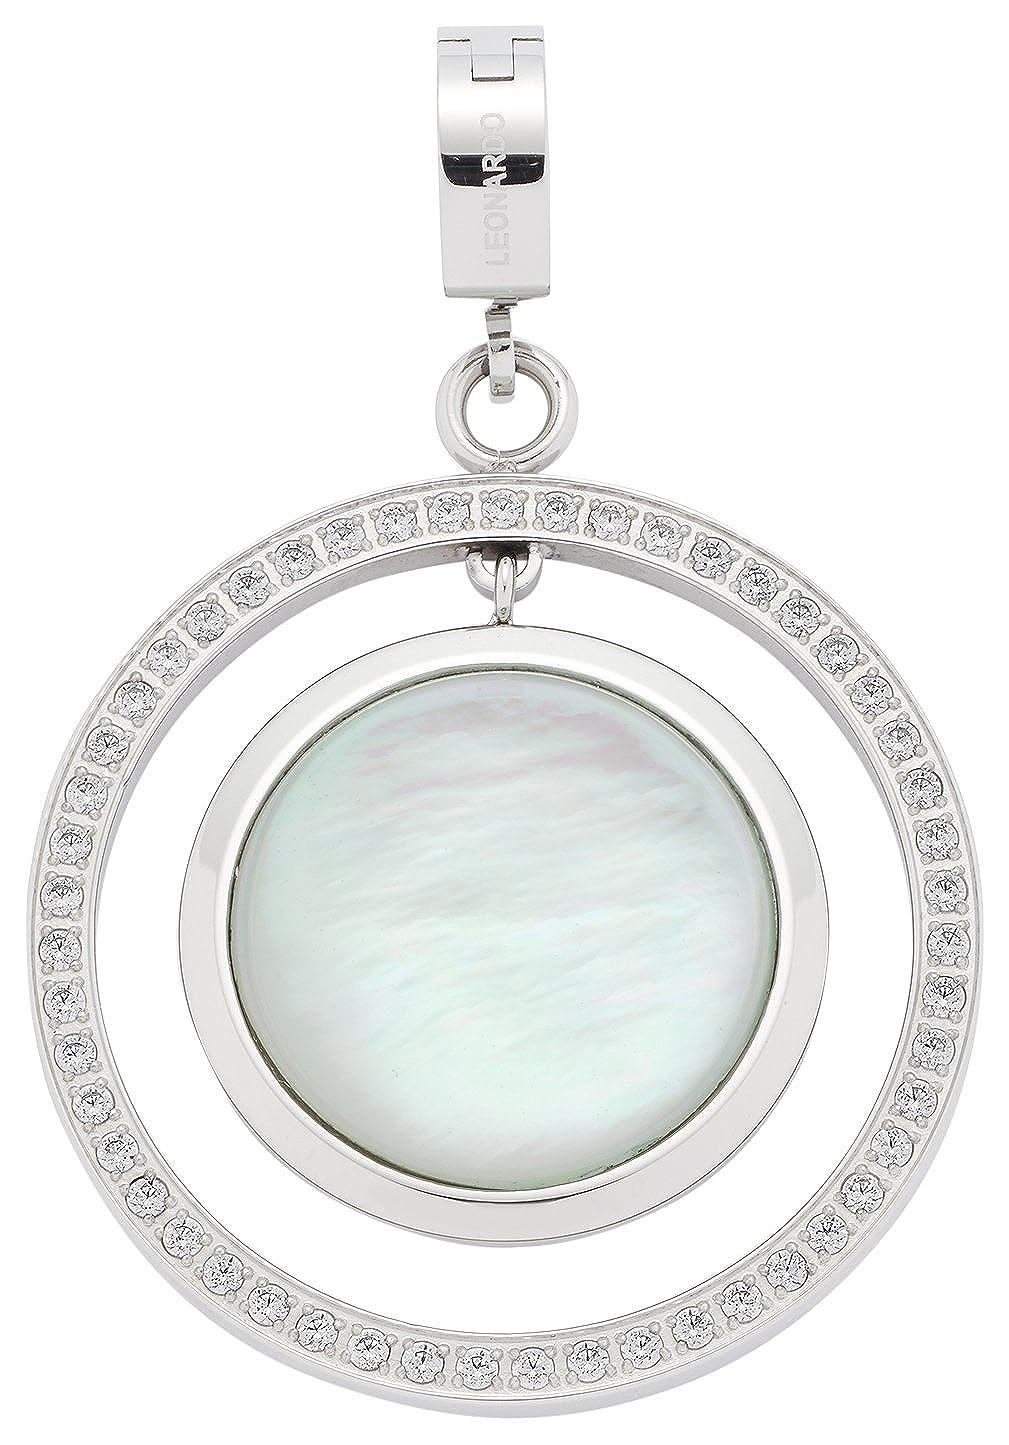 Leonardo Jewels Damen Anhänger Darlin's Graziella Edelstahl Glas mehrfarbig 016286